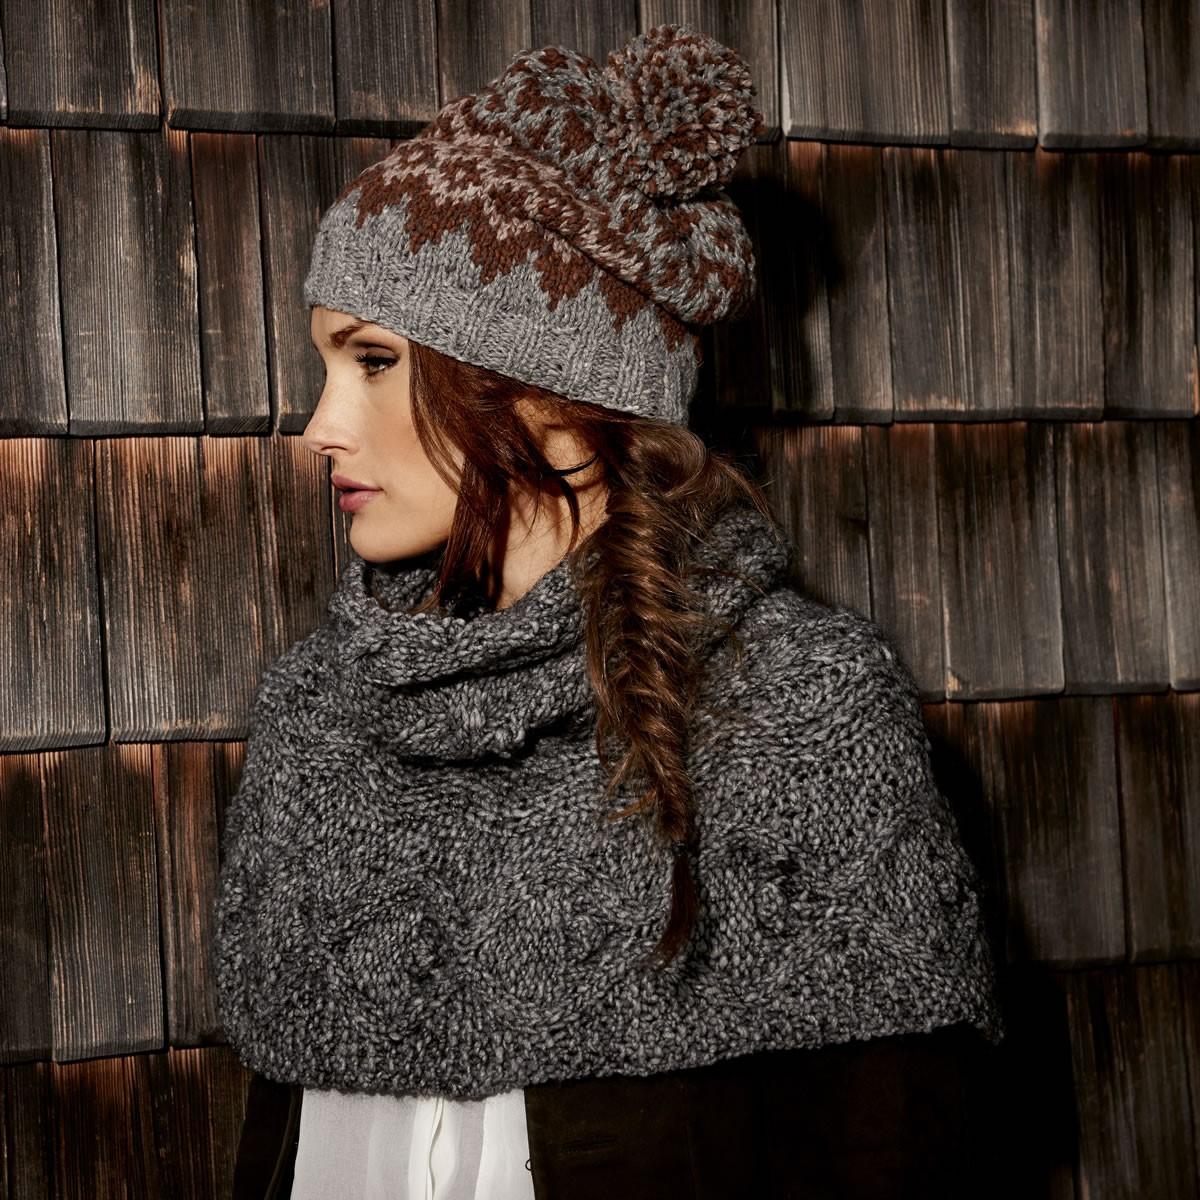 Lana Grossa KURZE ZIPFELMÜTZE Royal Tweed